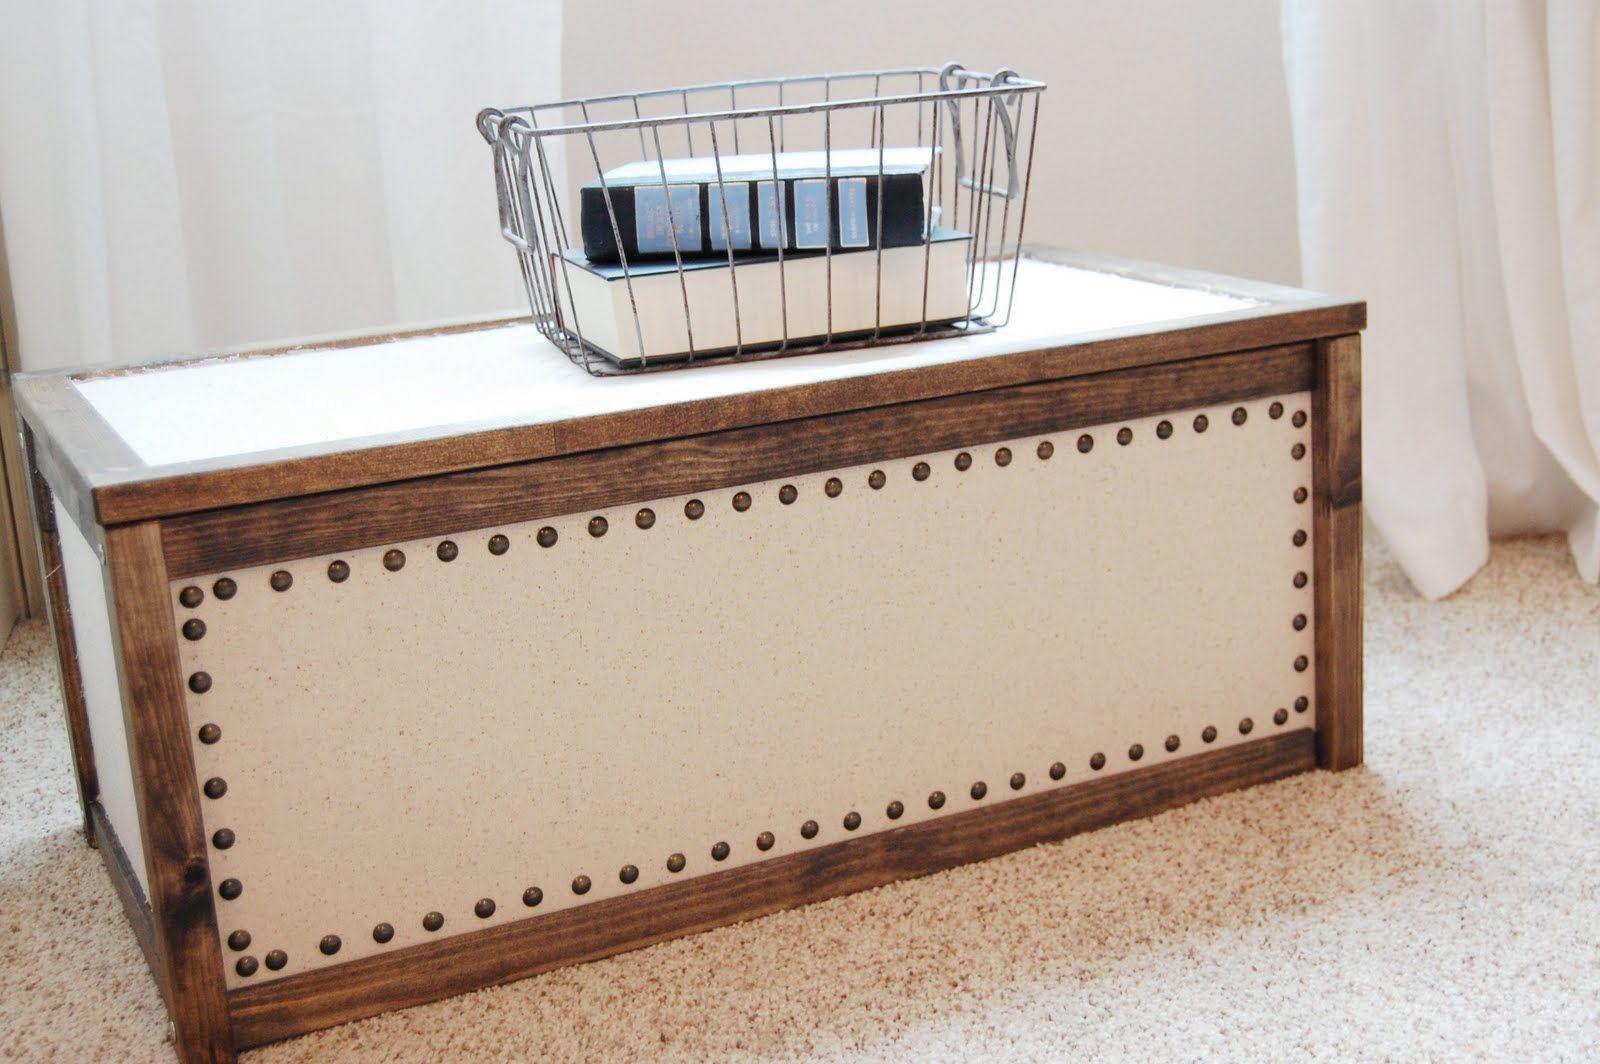 IKEA APA Storage Box 1499 Hack Wood Stained And Nailhead Trim Added